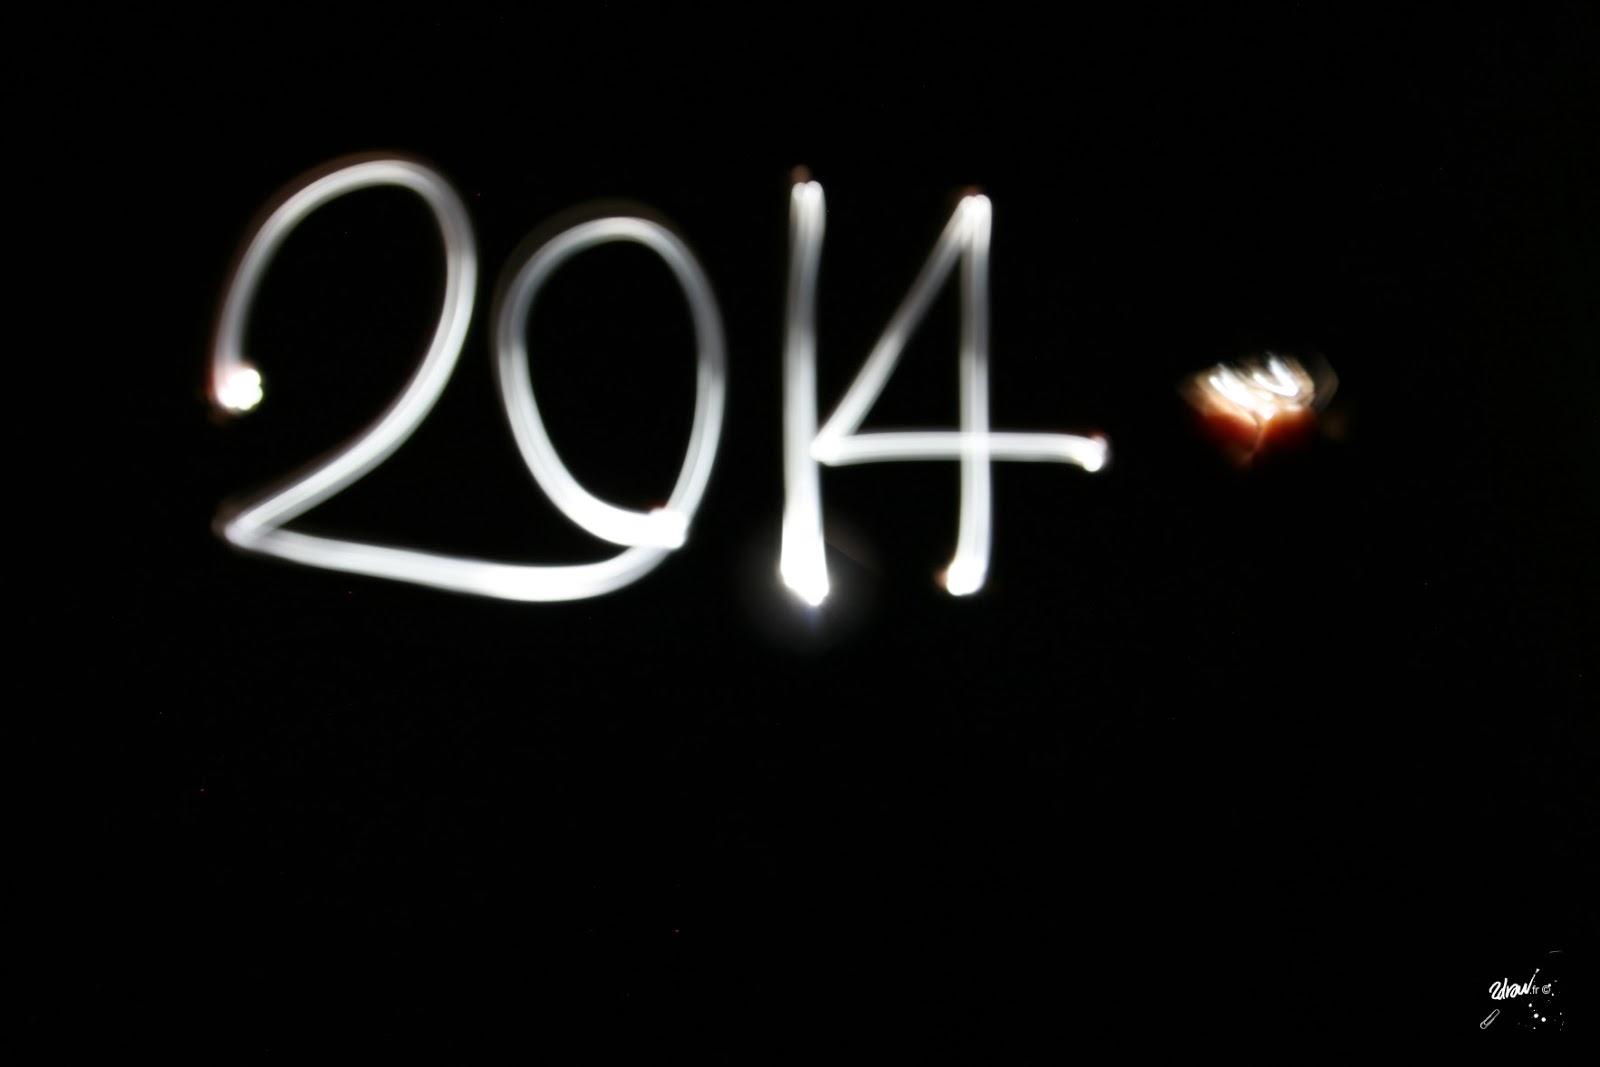 2014 2draw graphiste